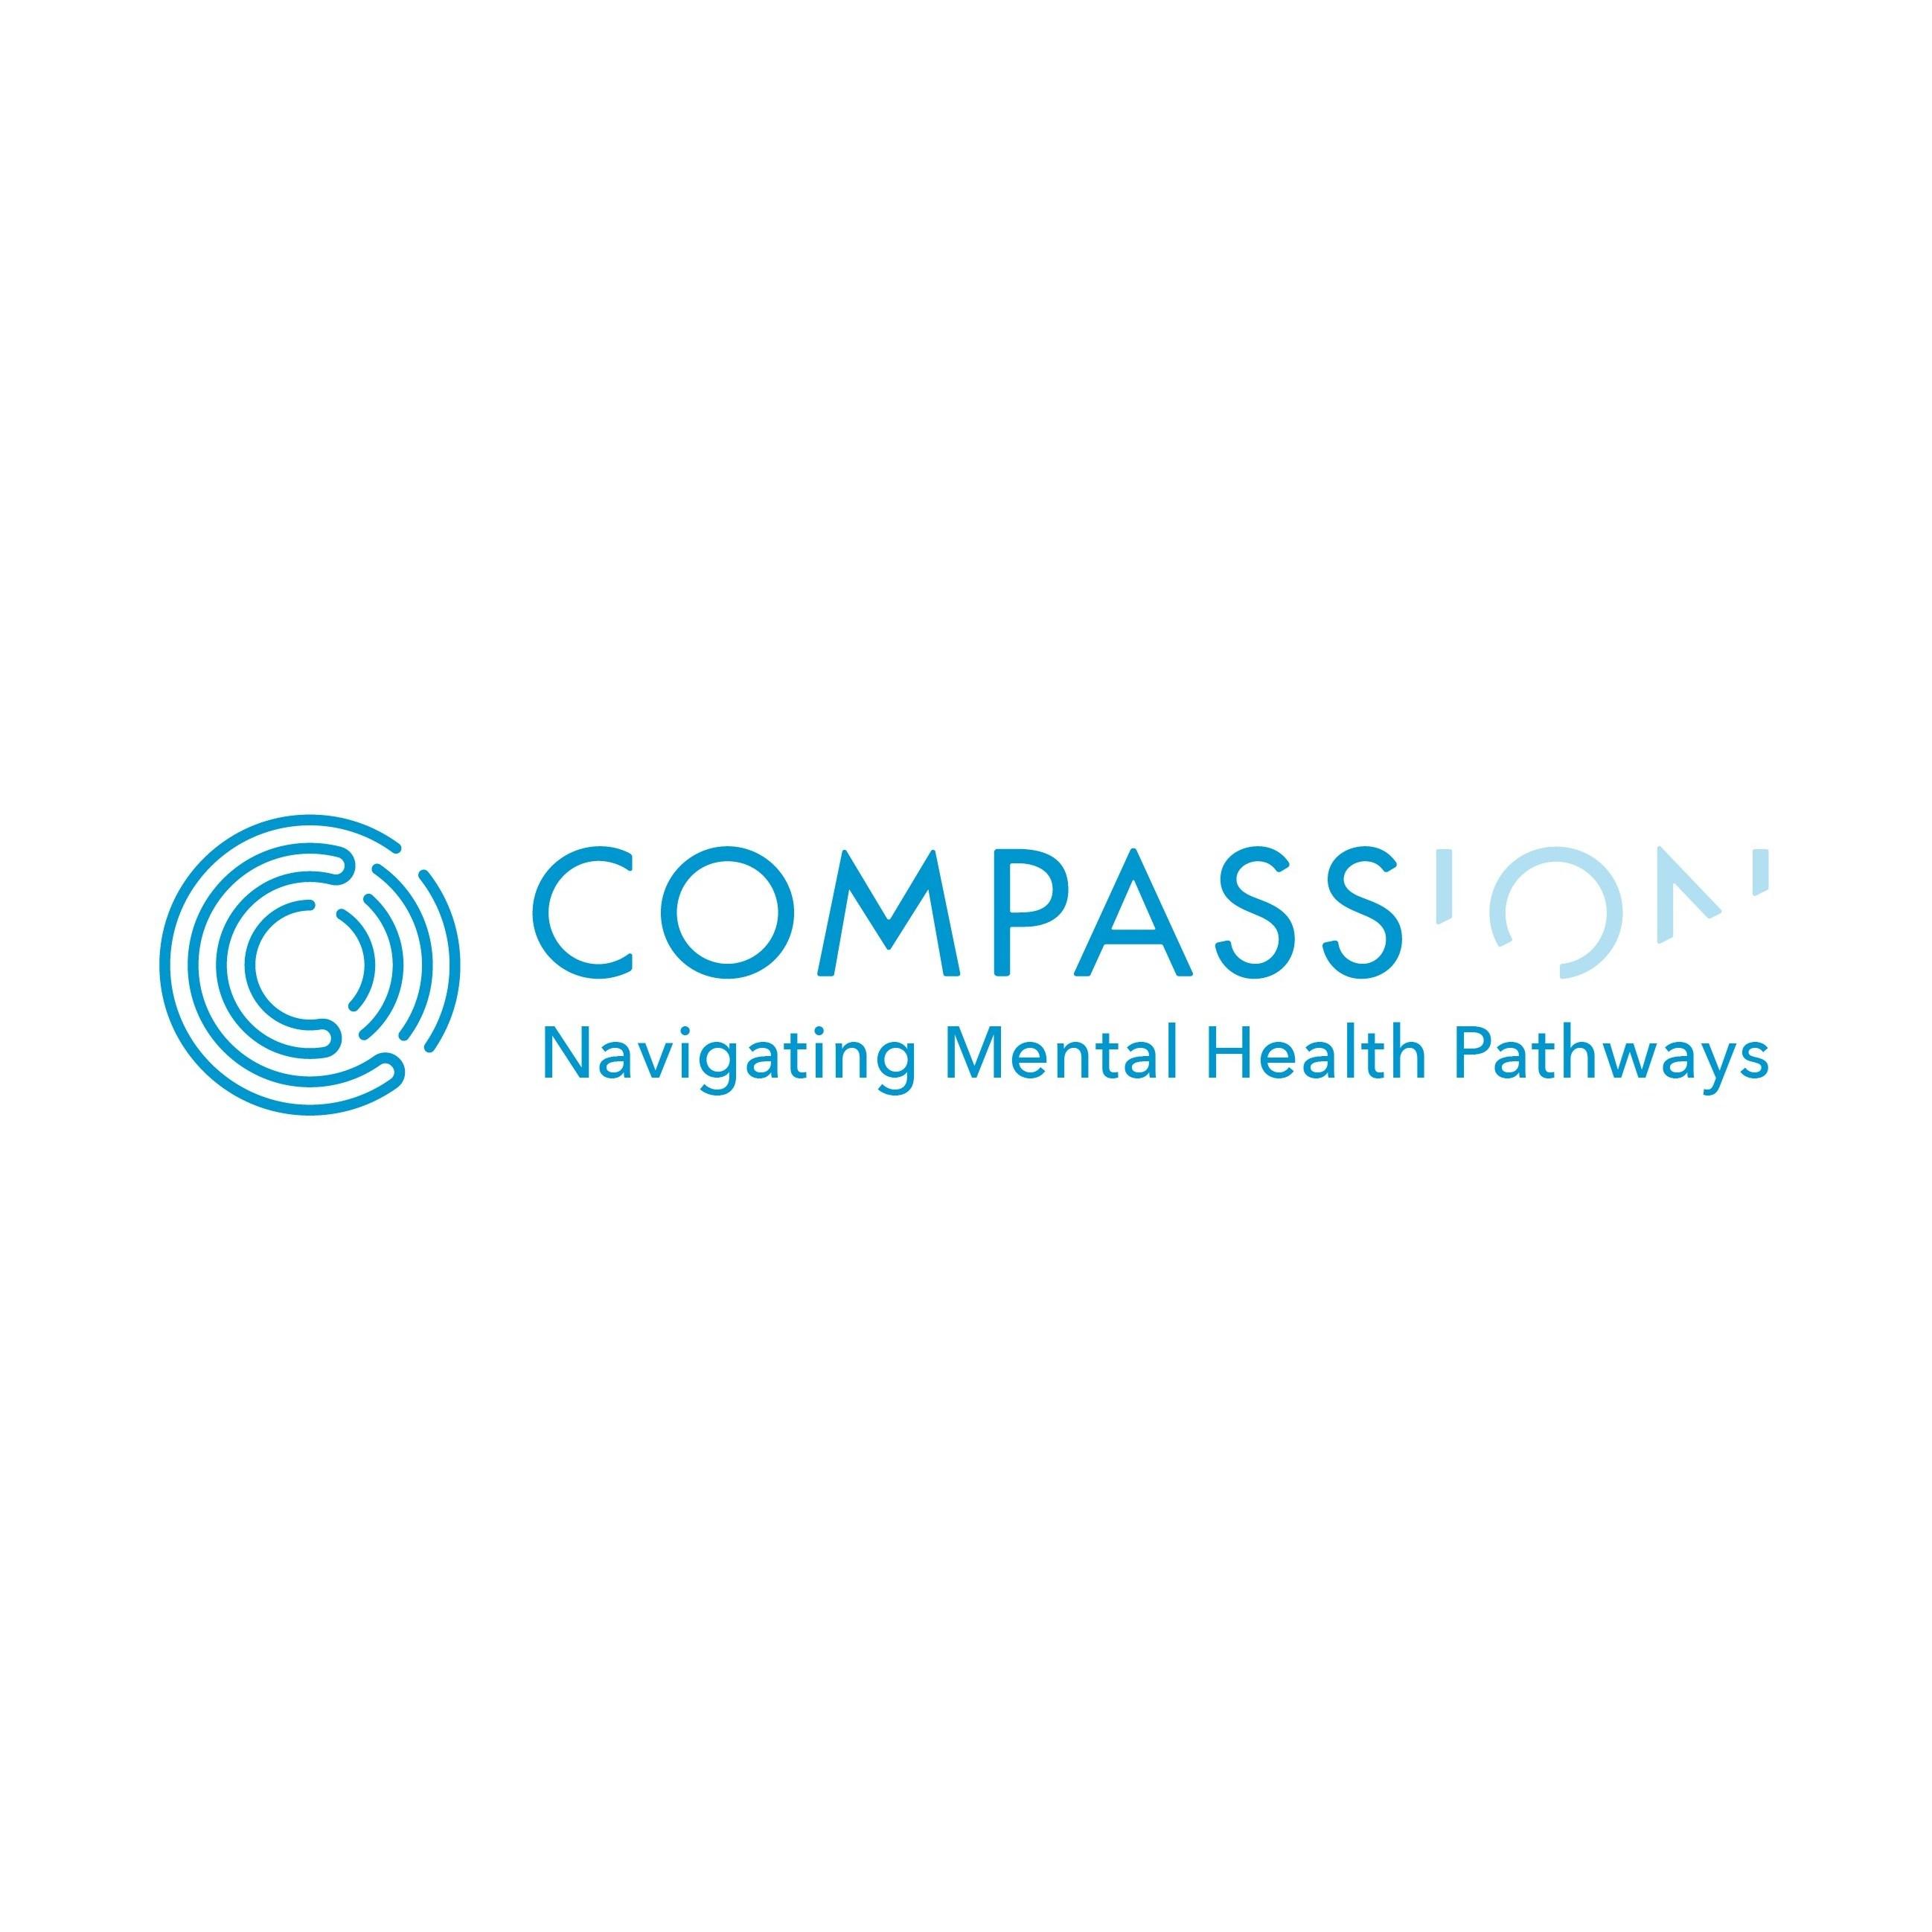 Compass Pathways